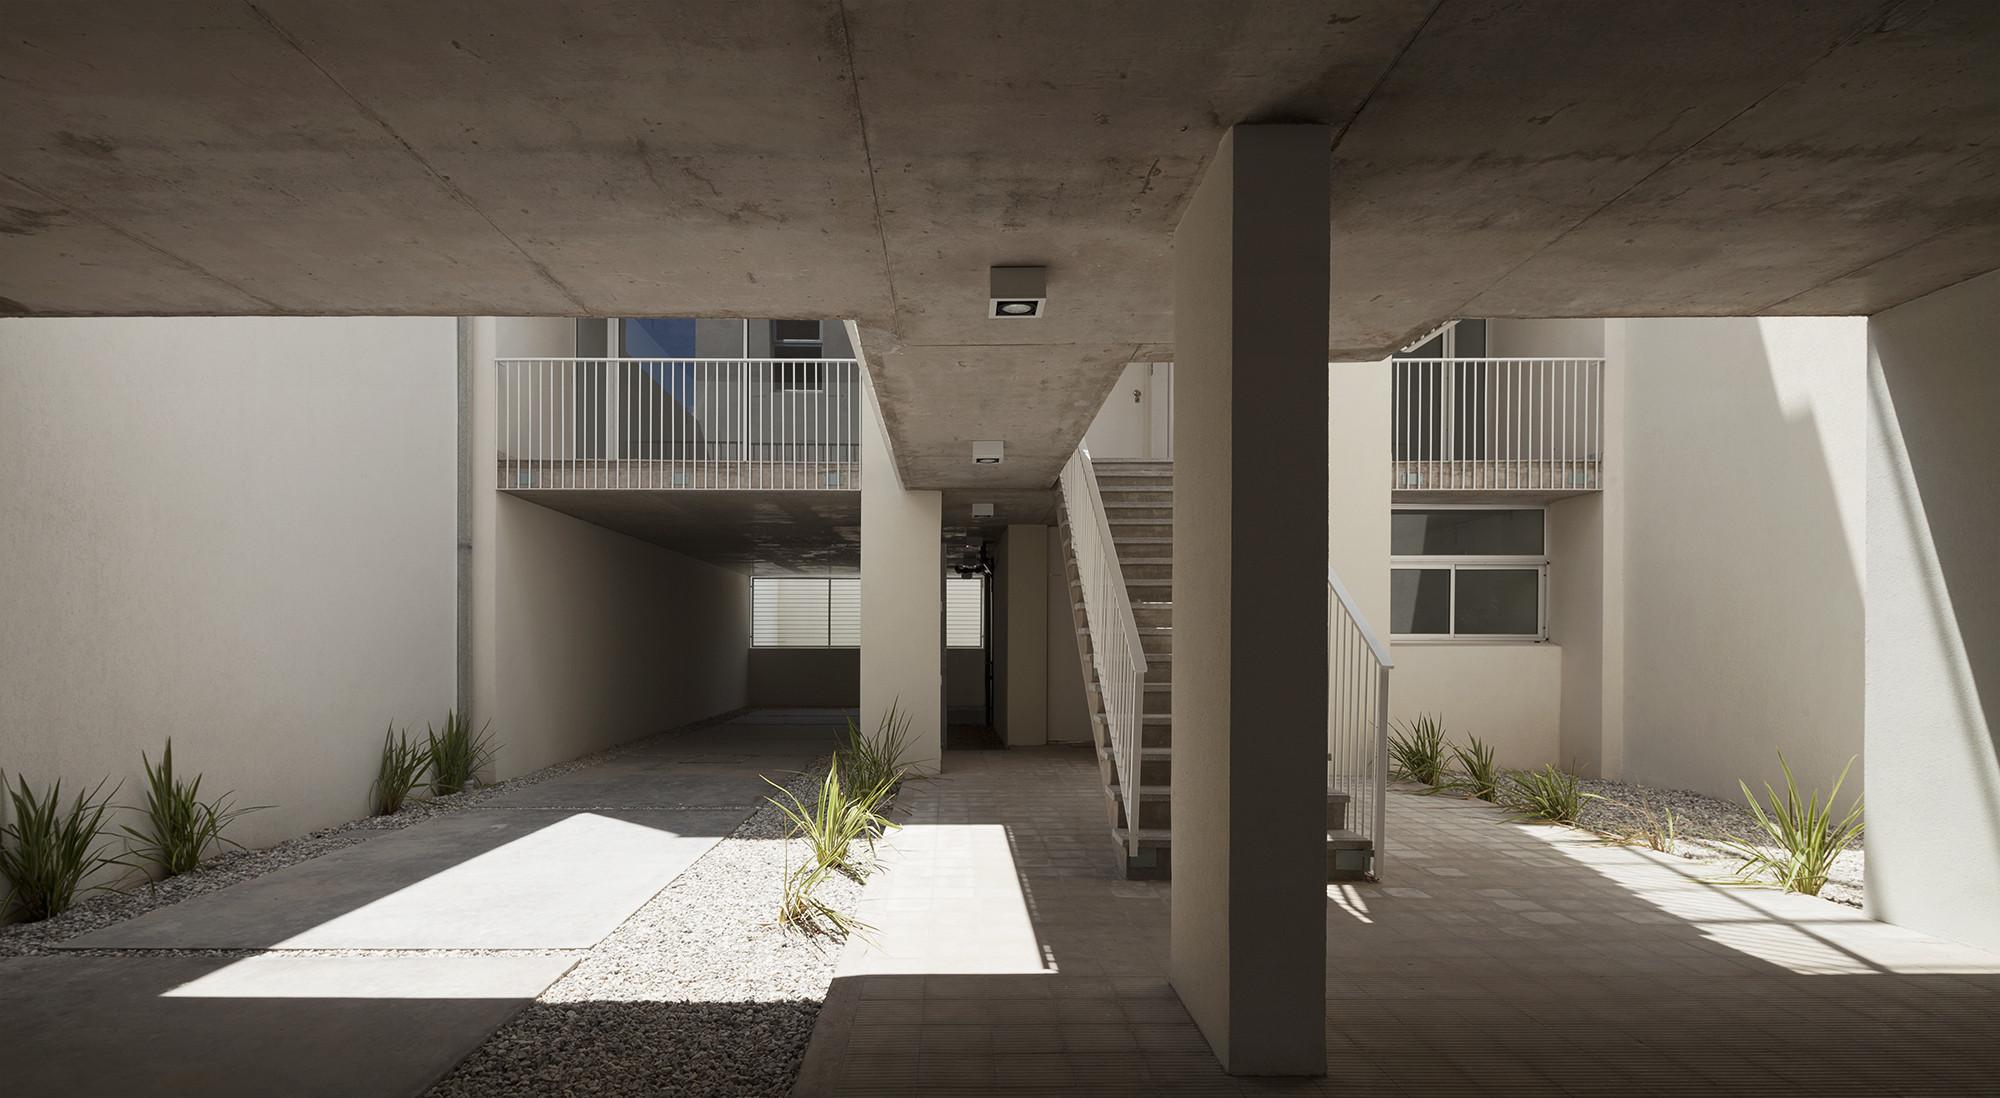 Avellaneda Project / LOF / Colectivo de Arquitectura, © Federico Cairoli